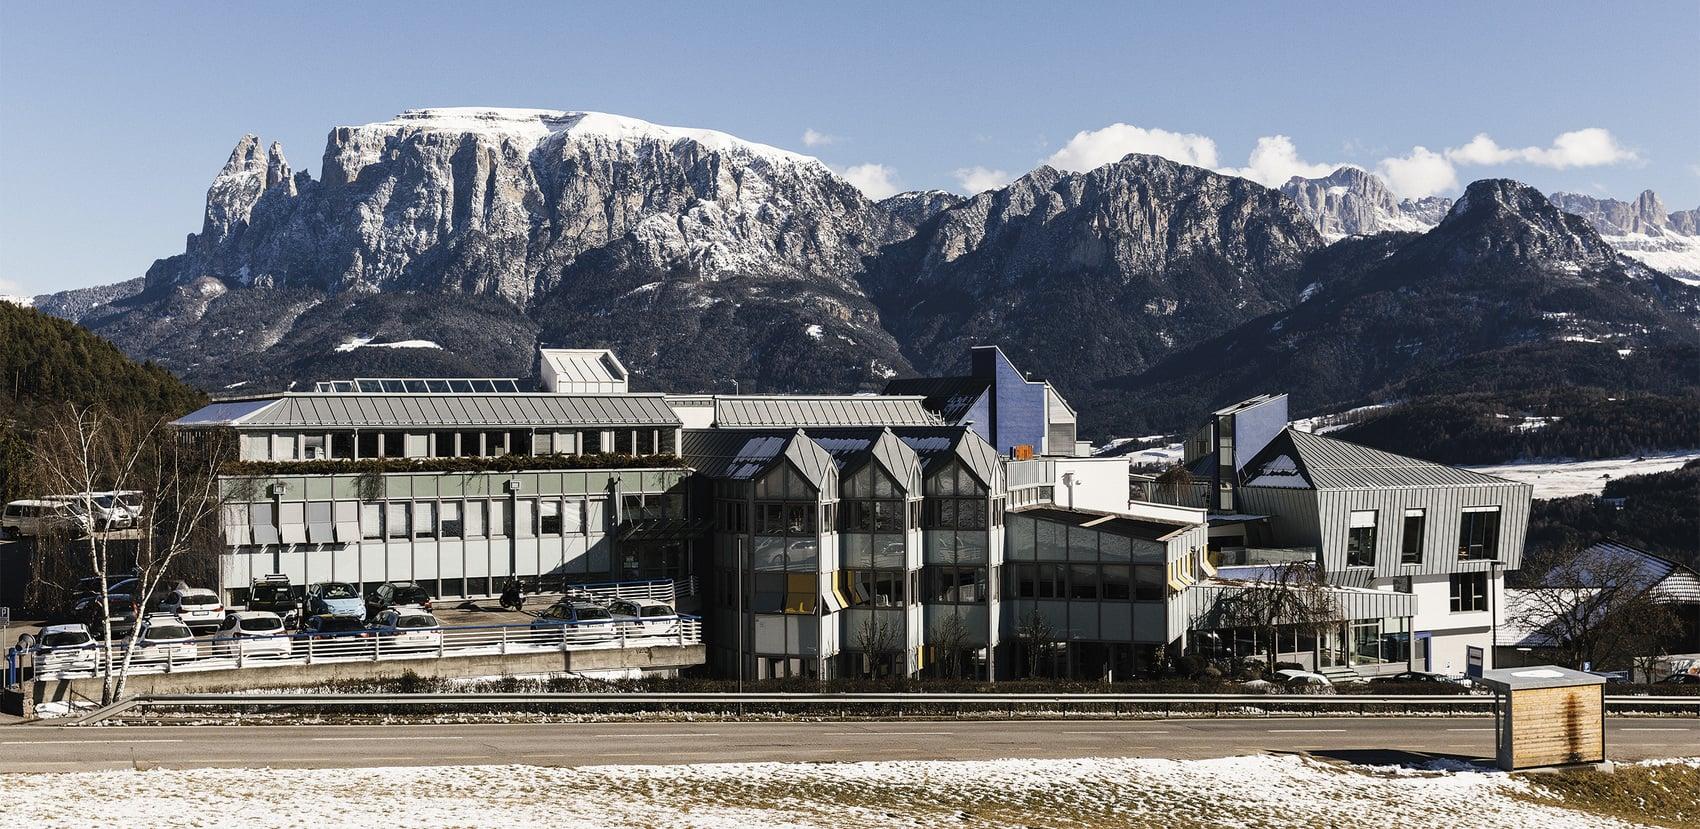 Finstral-Hoofdkantoor in Unterinn am Ritten